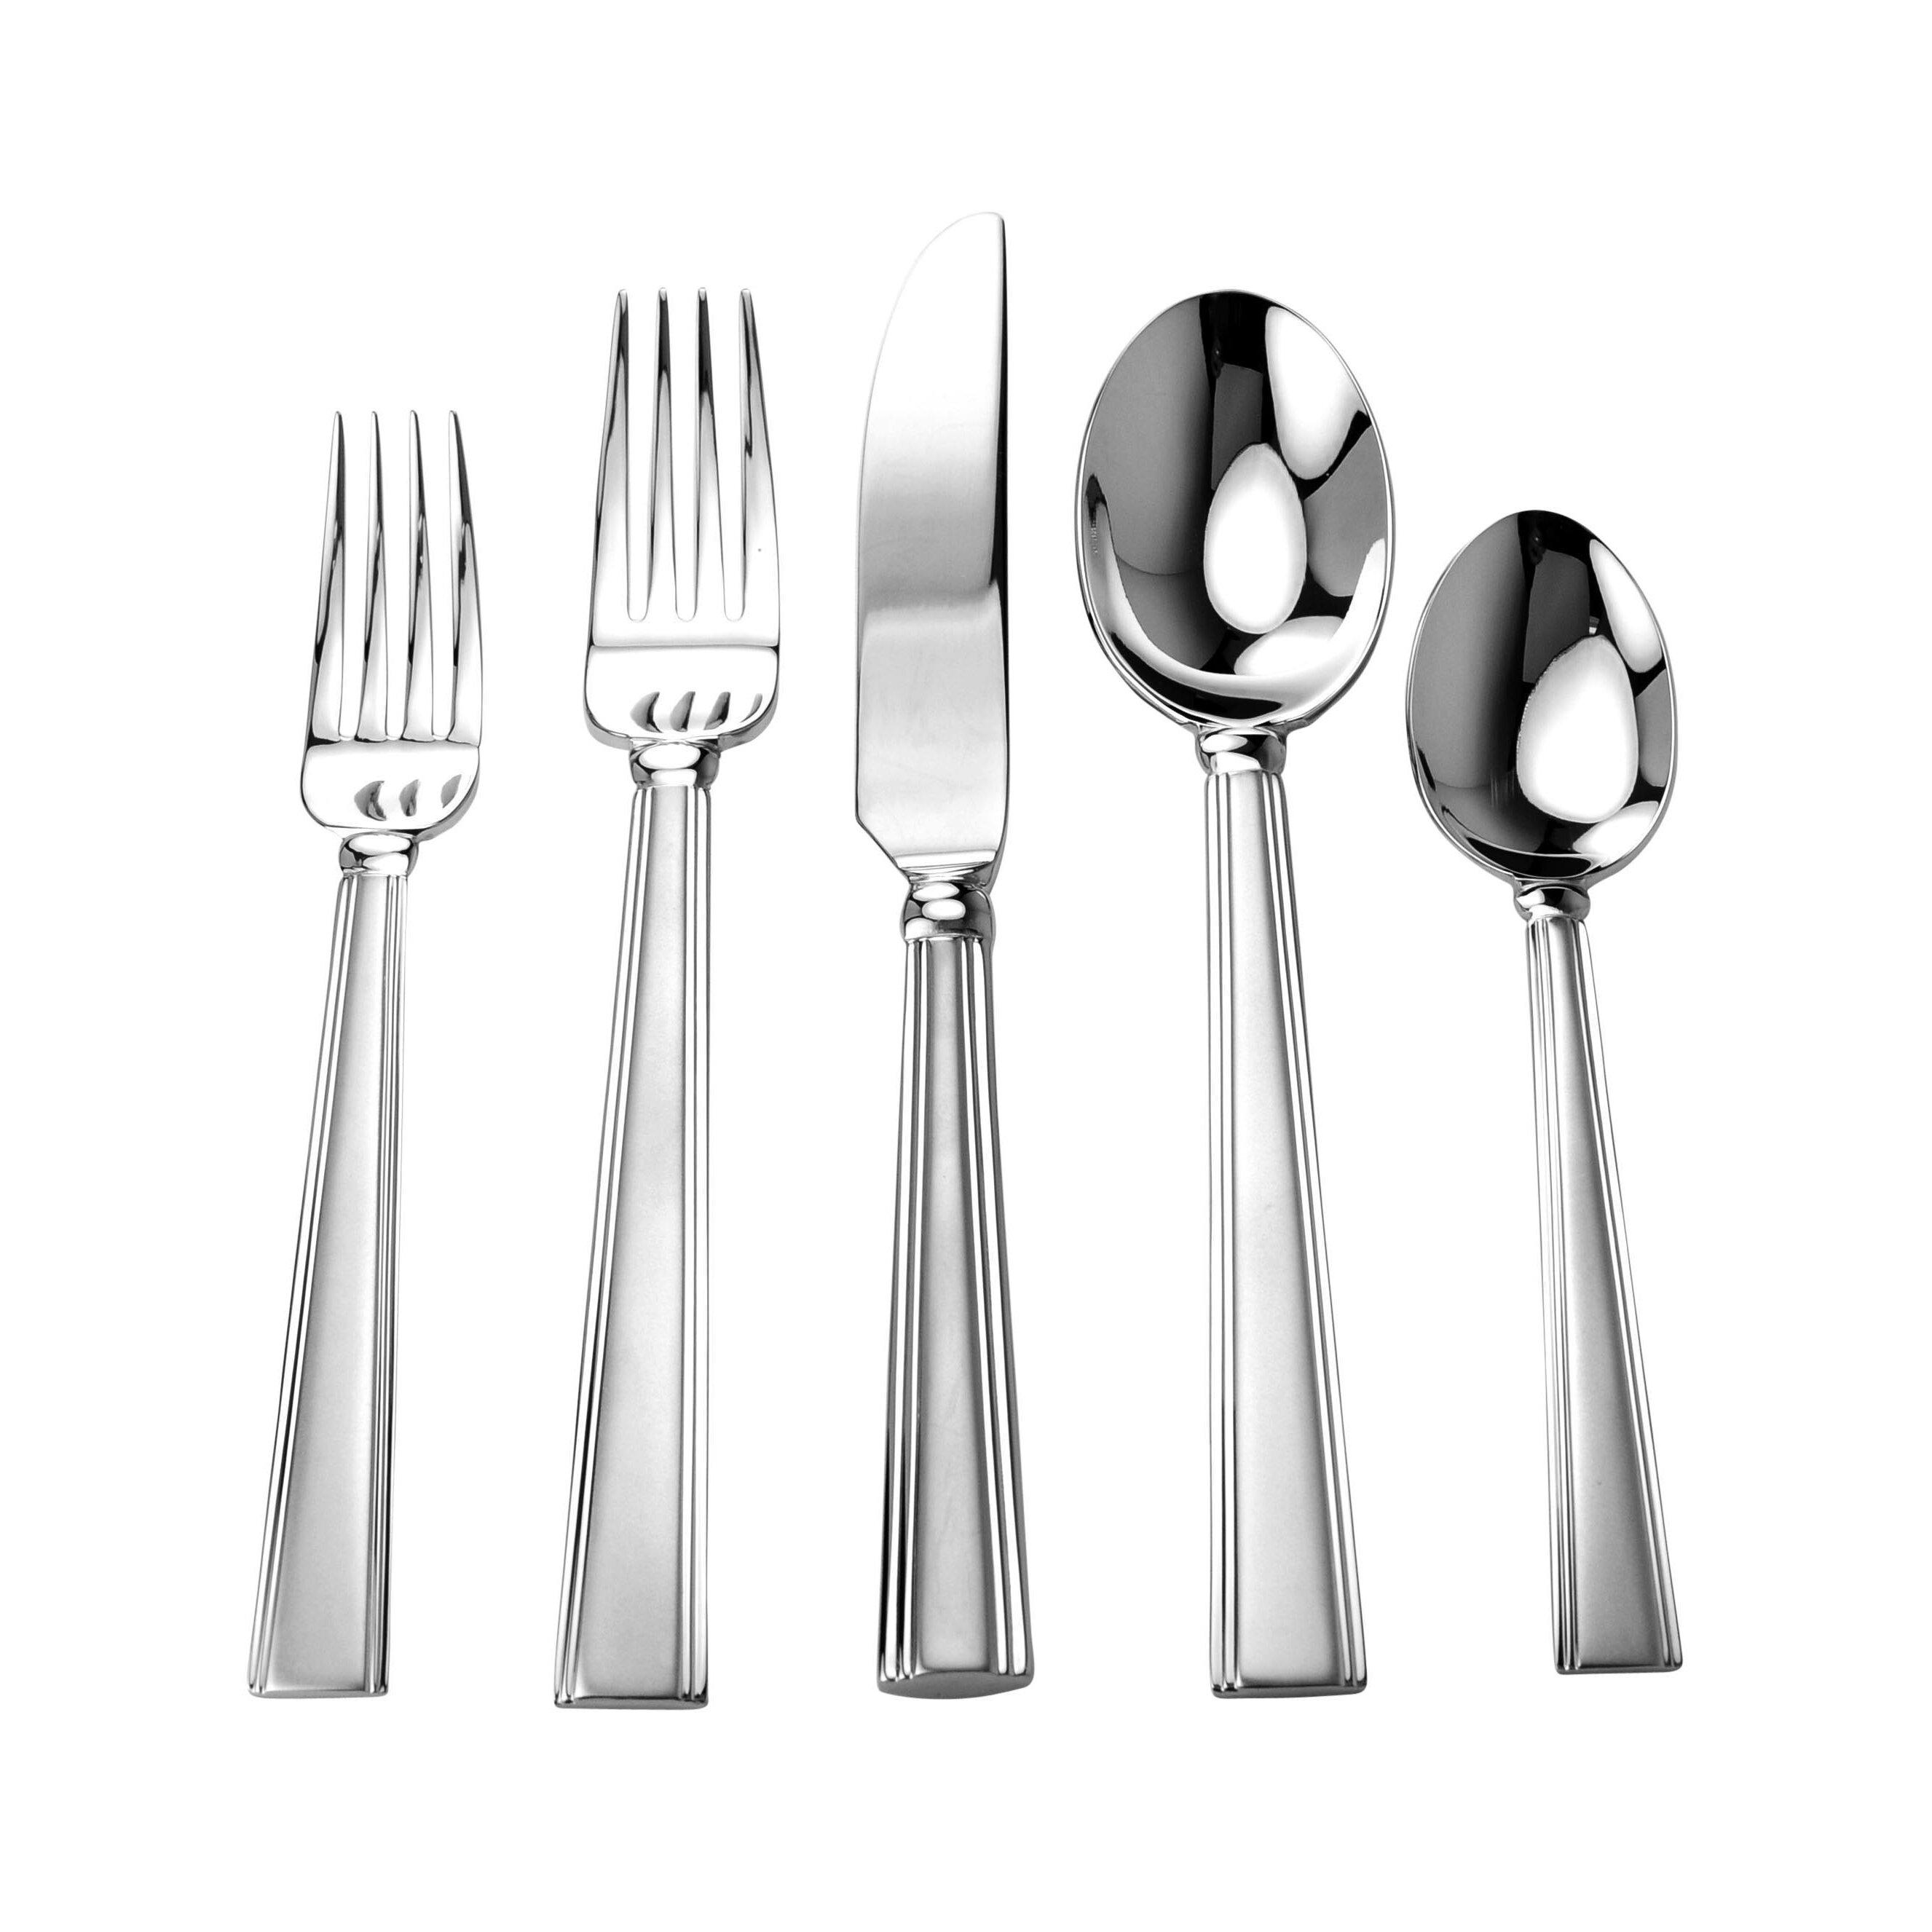 David shaw silverware splendide artik 20 piece flatware set reviews wayfair - Splendide flatware ...